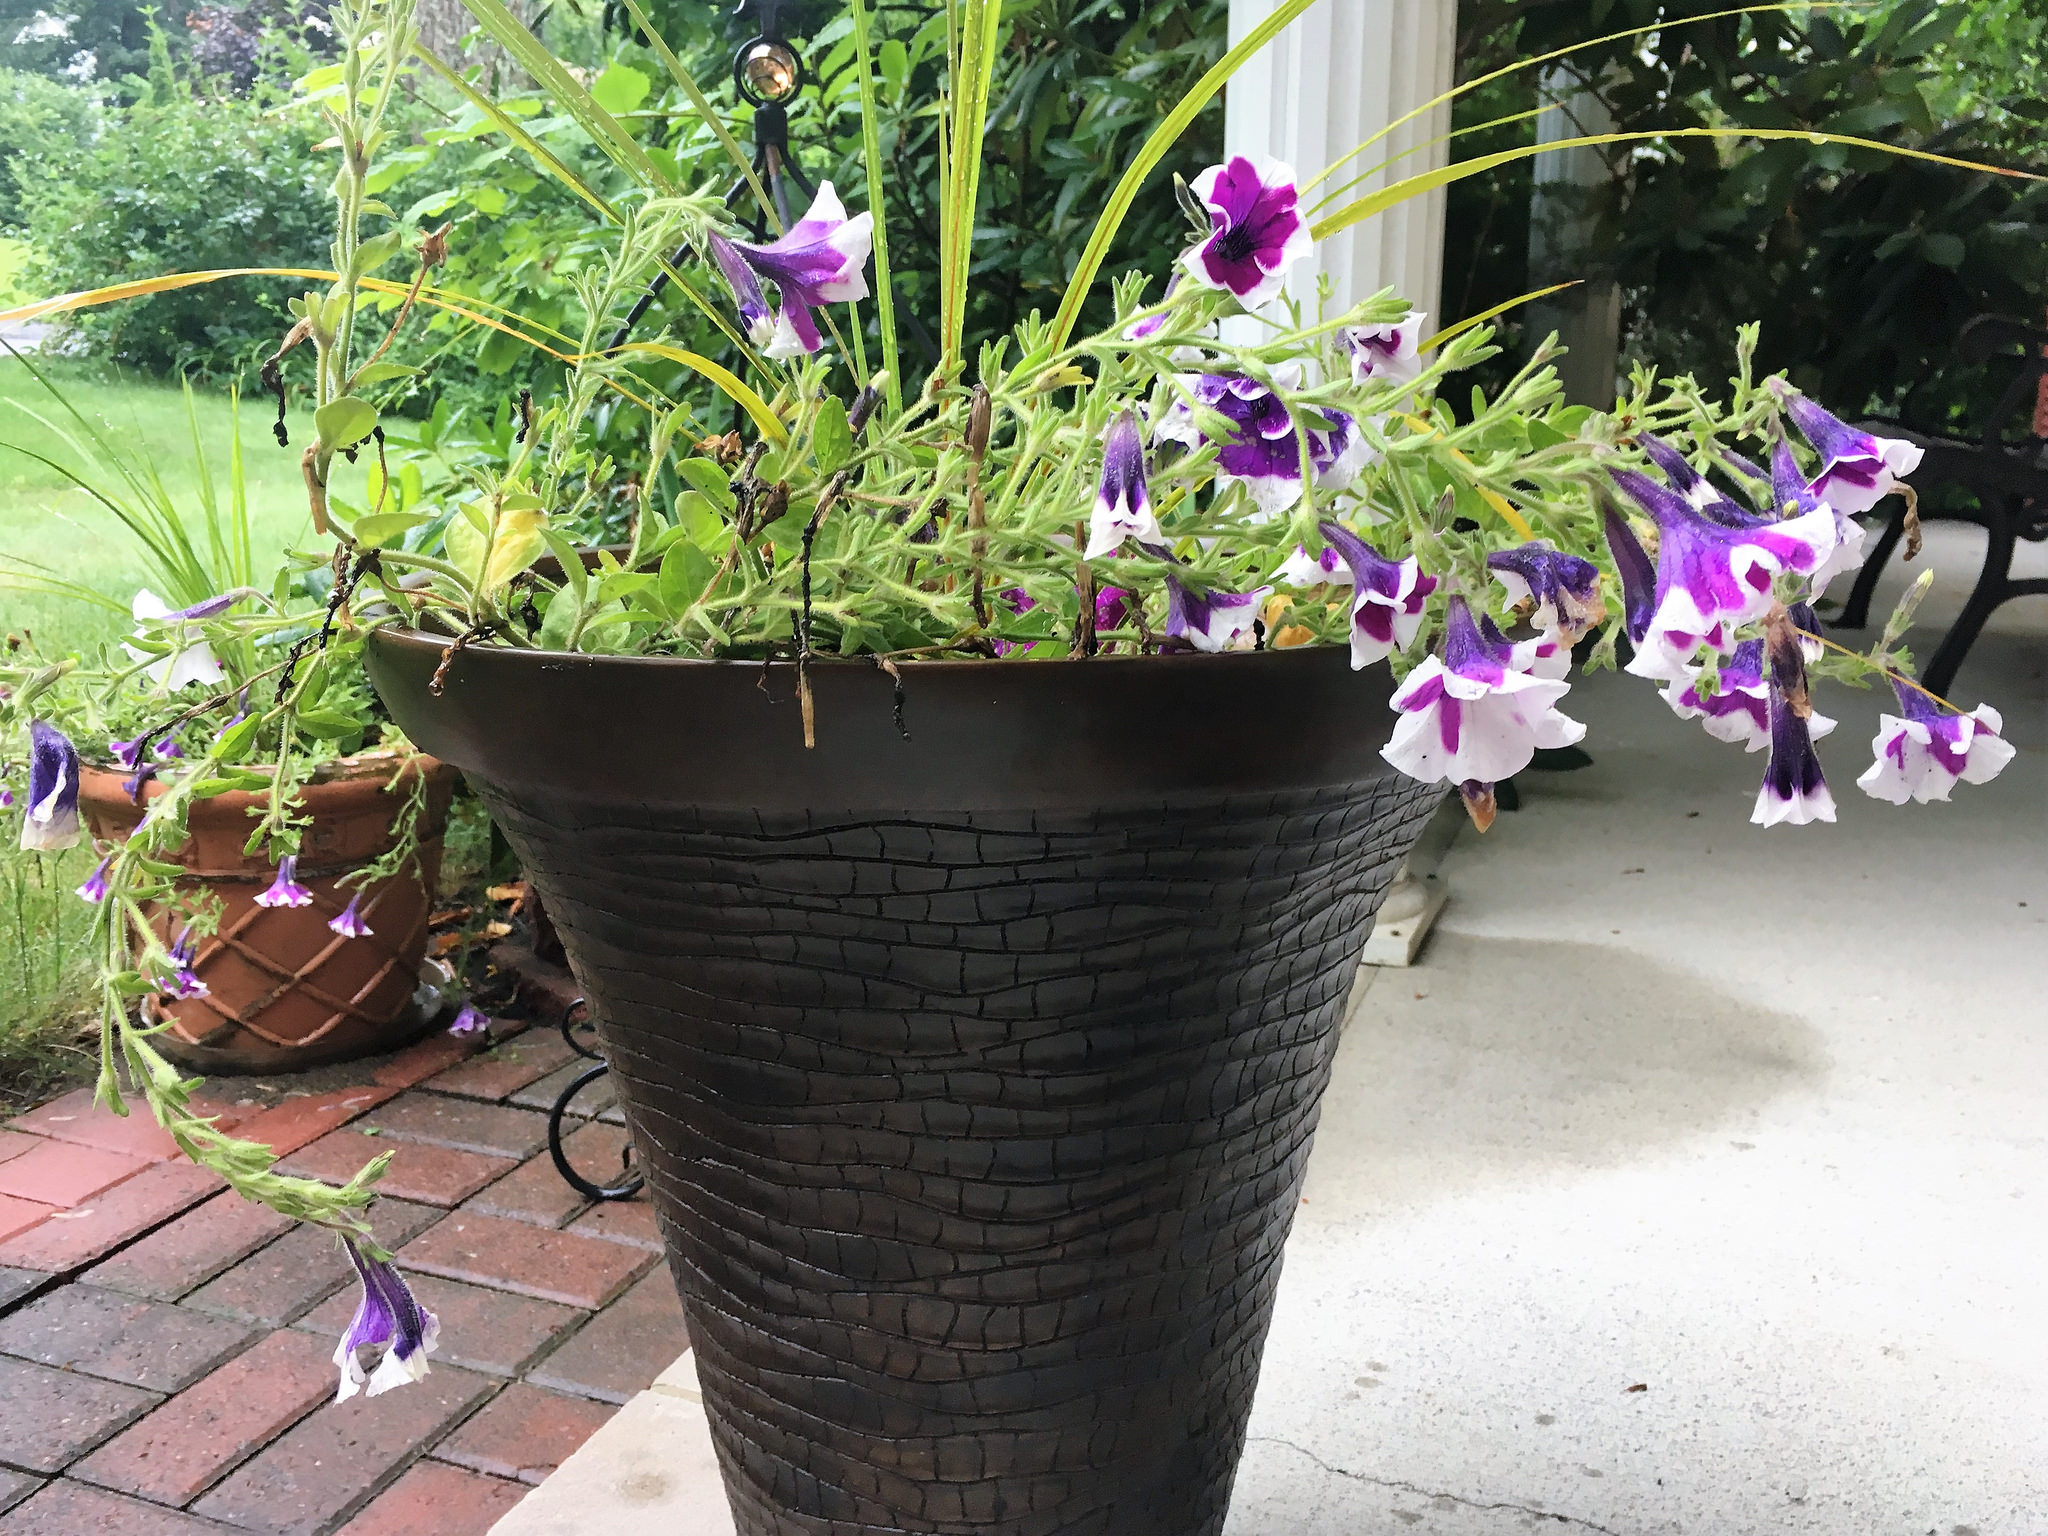 gift giving - pot for plants - gift for mom